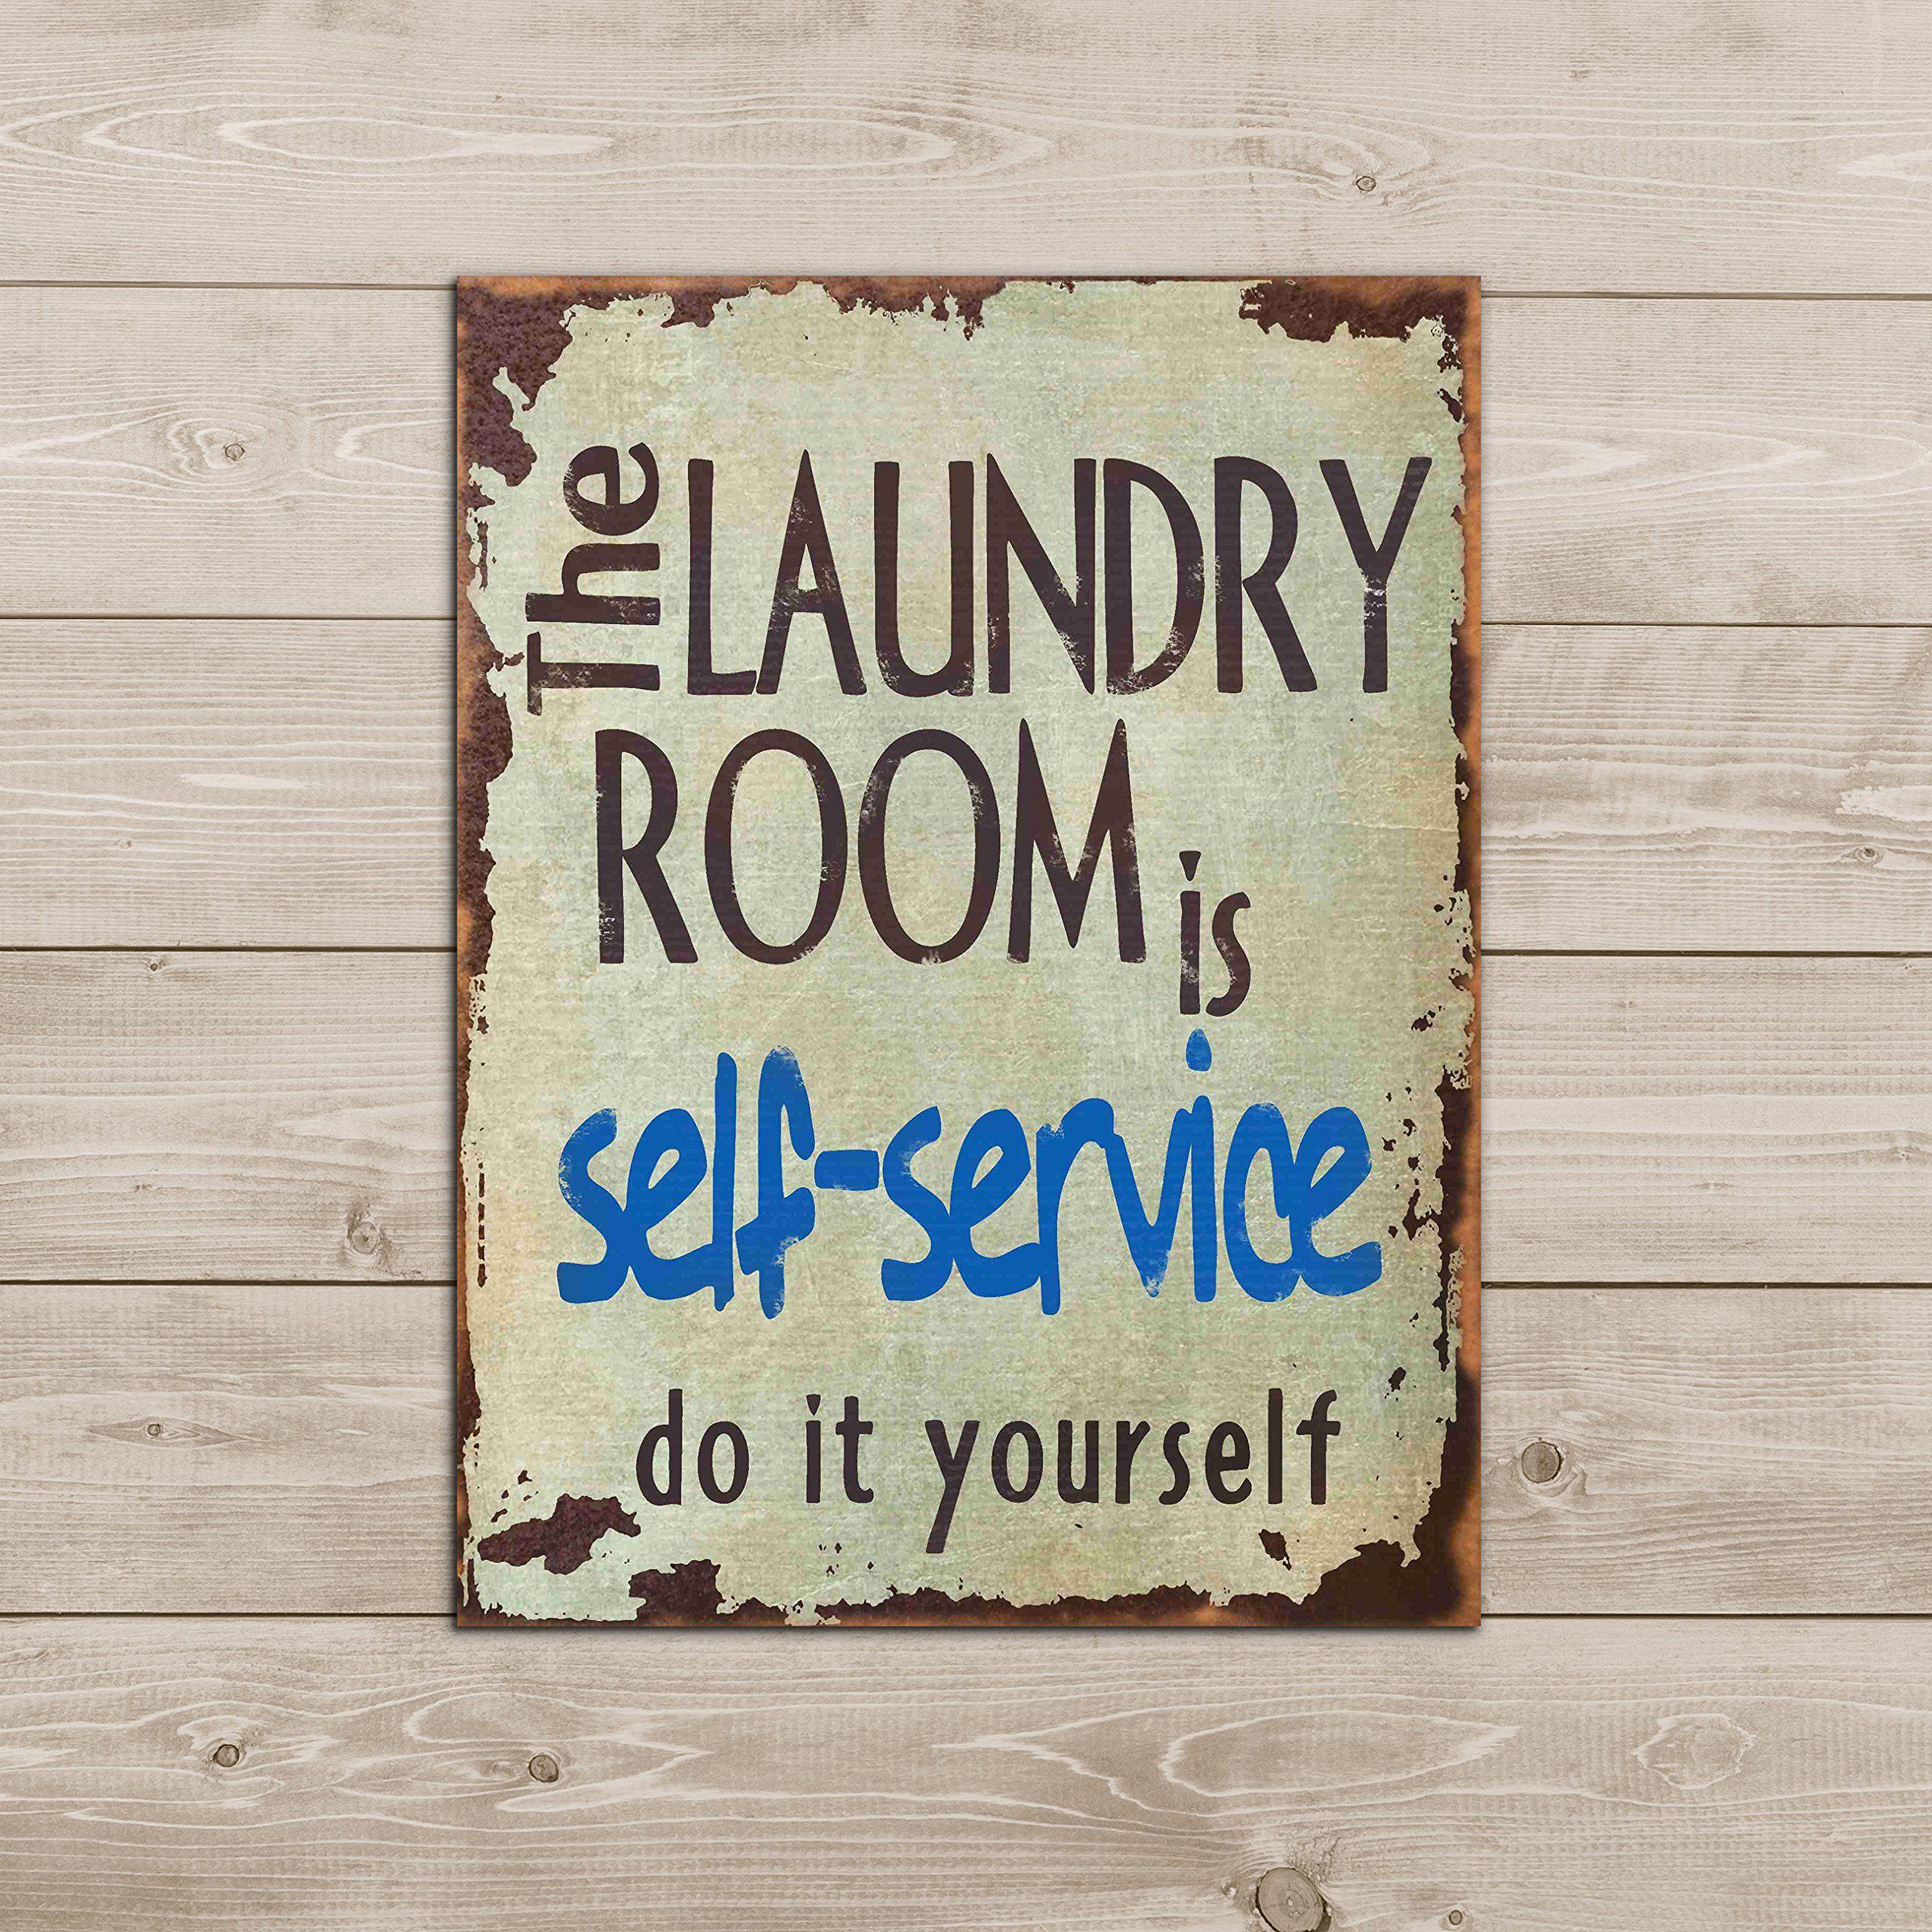 Barnyard Designs The Laundry Room Is Self Service Retro Vintage